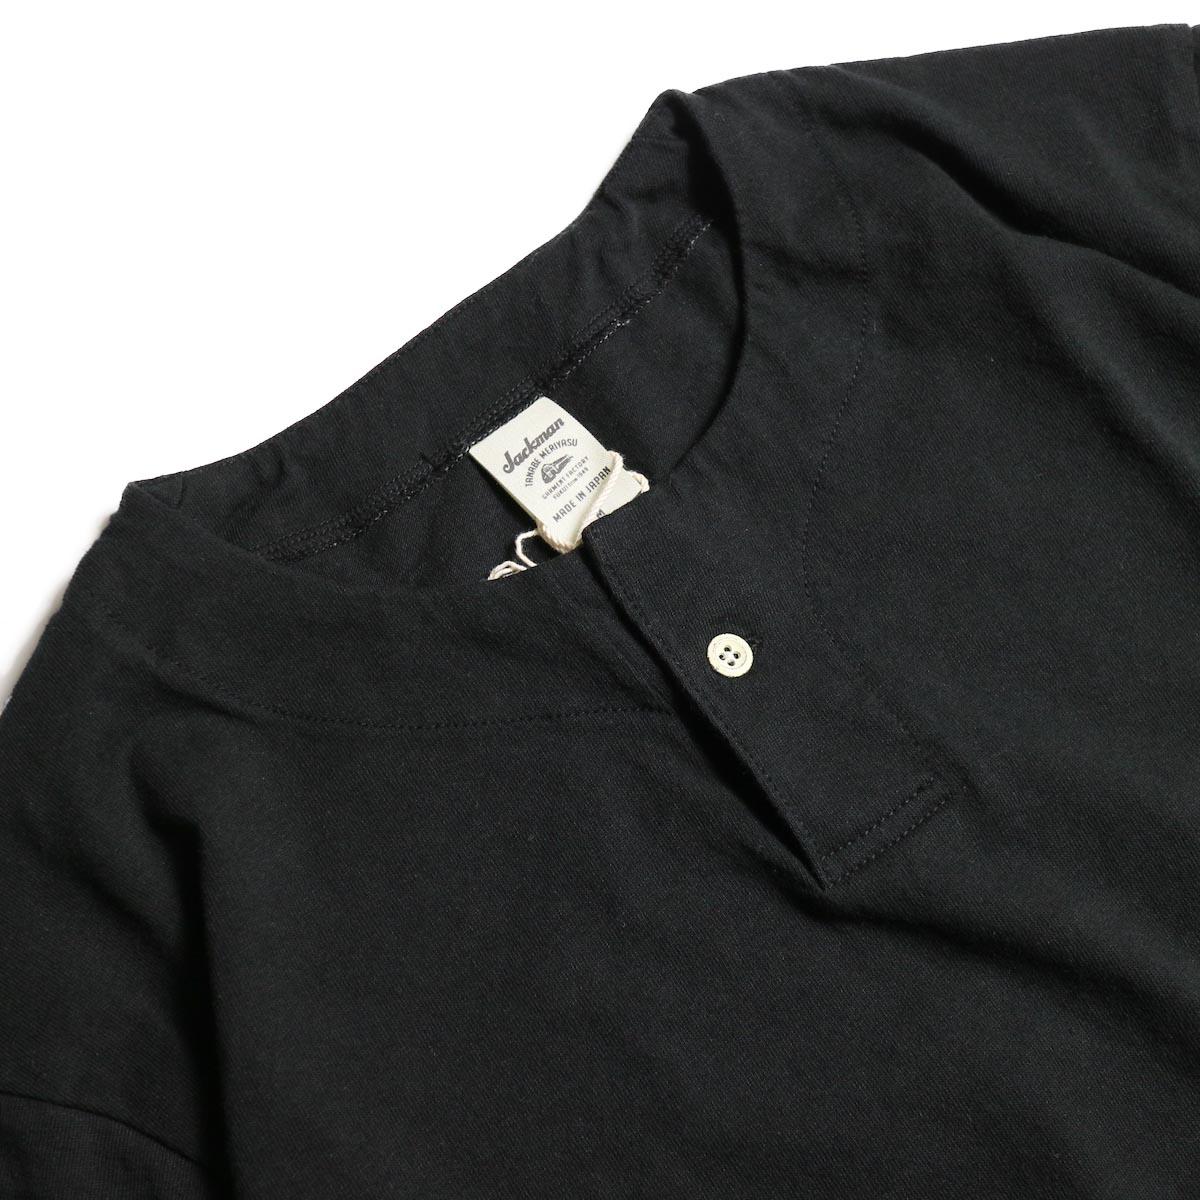 Jackman / Henley neck T-Shirt (Black)ヘンリーネック